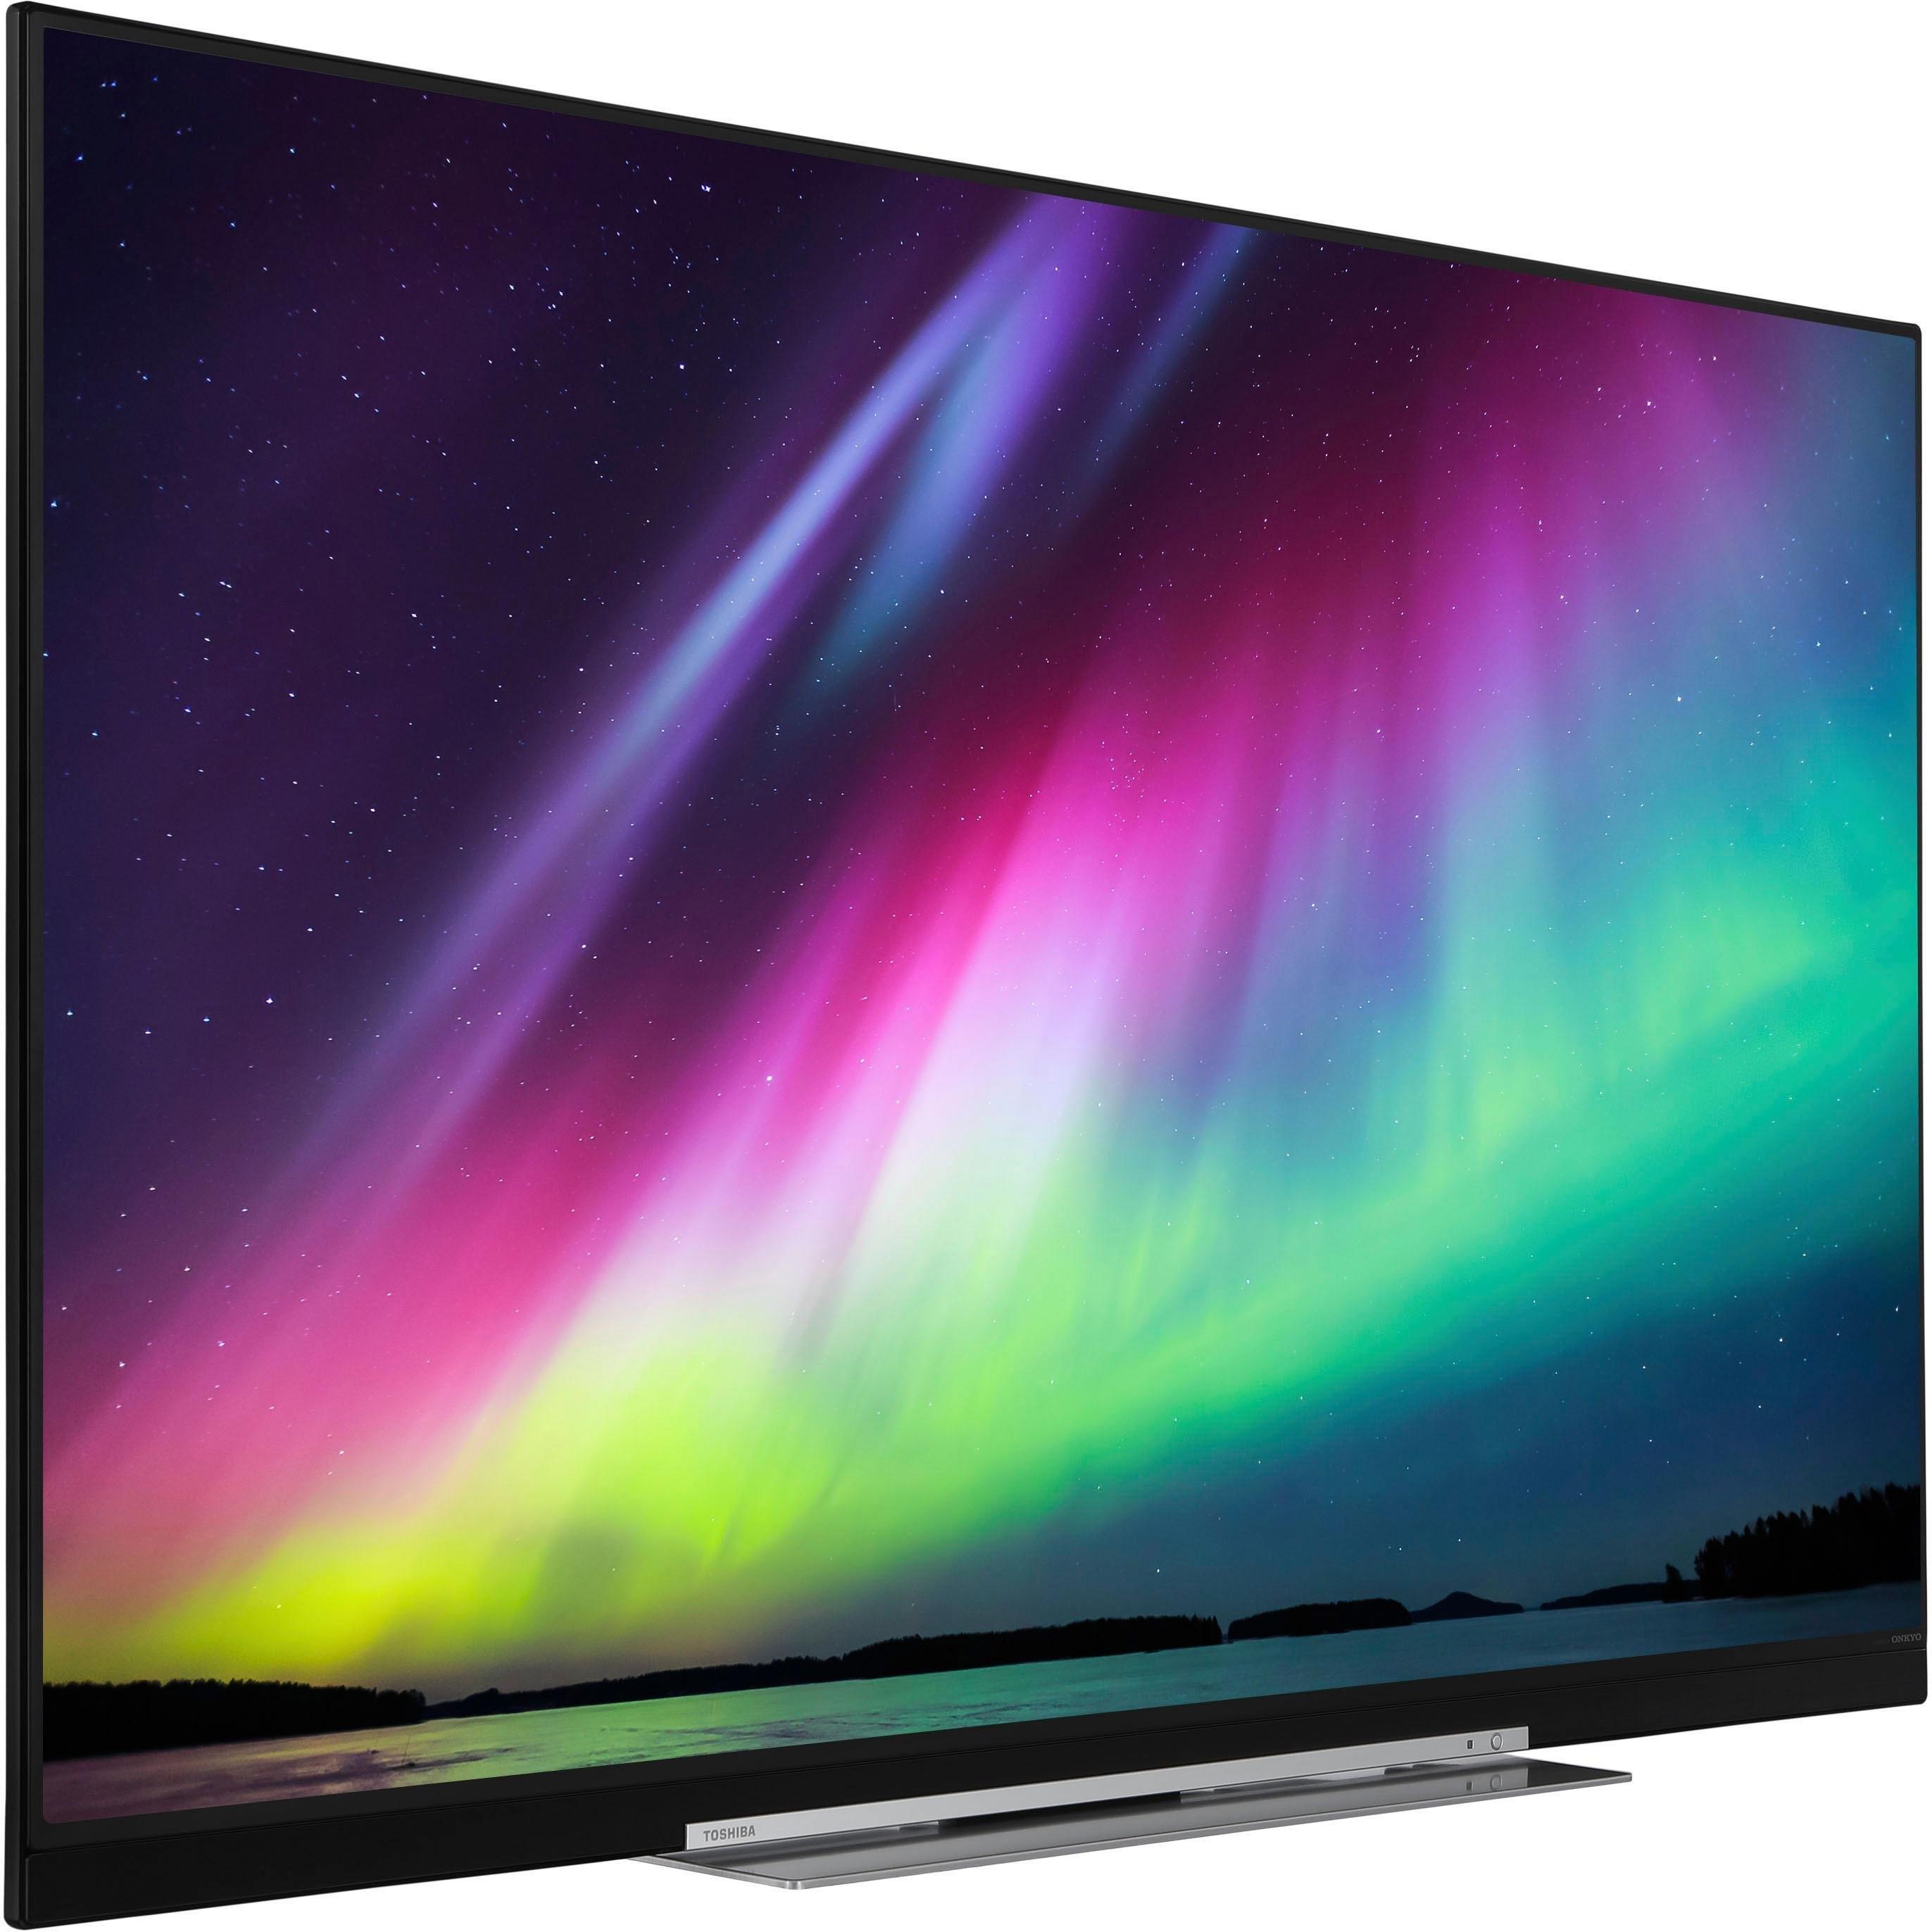 Toshiba 55U7863DA led-tv (140 cm / 55 inch), 4K Ultra HD, smart-tv bij OTTO online kopen